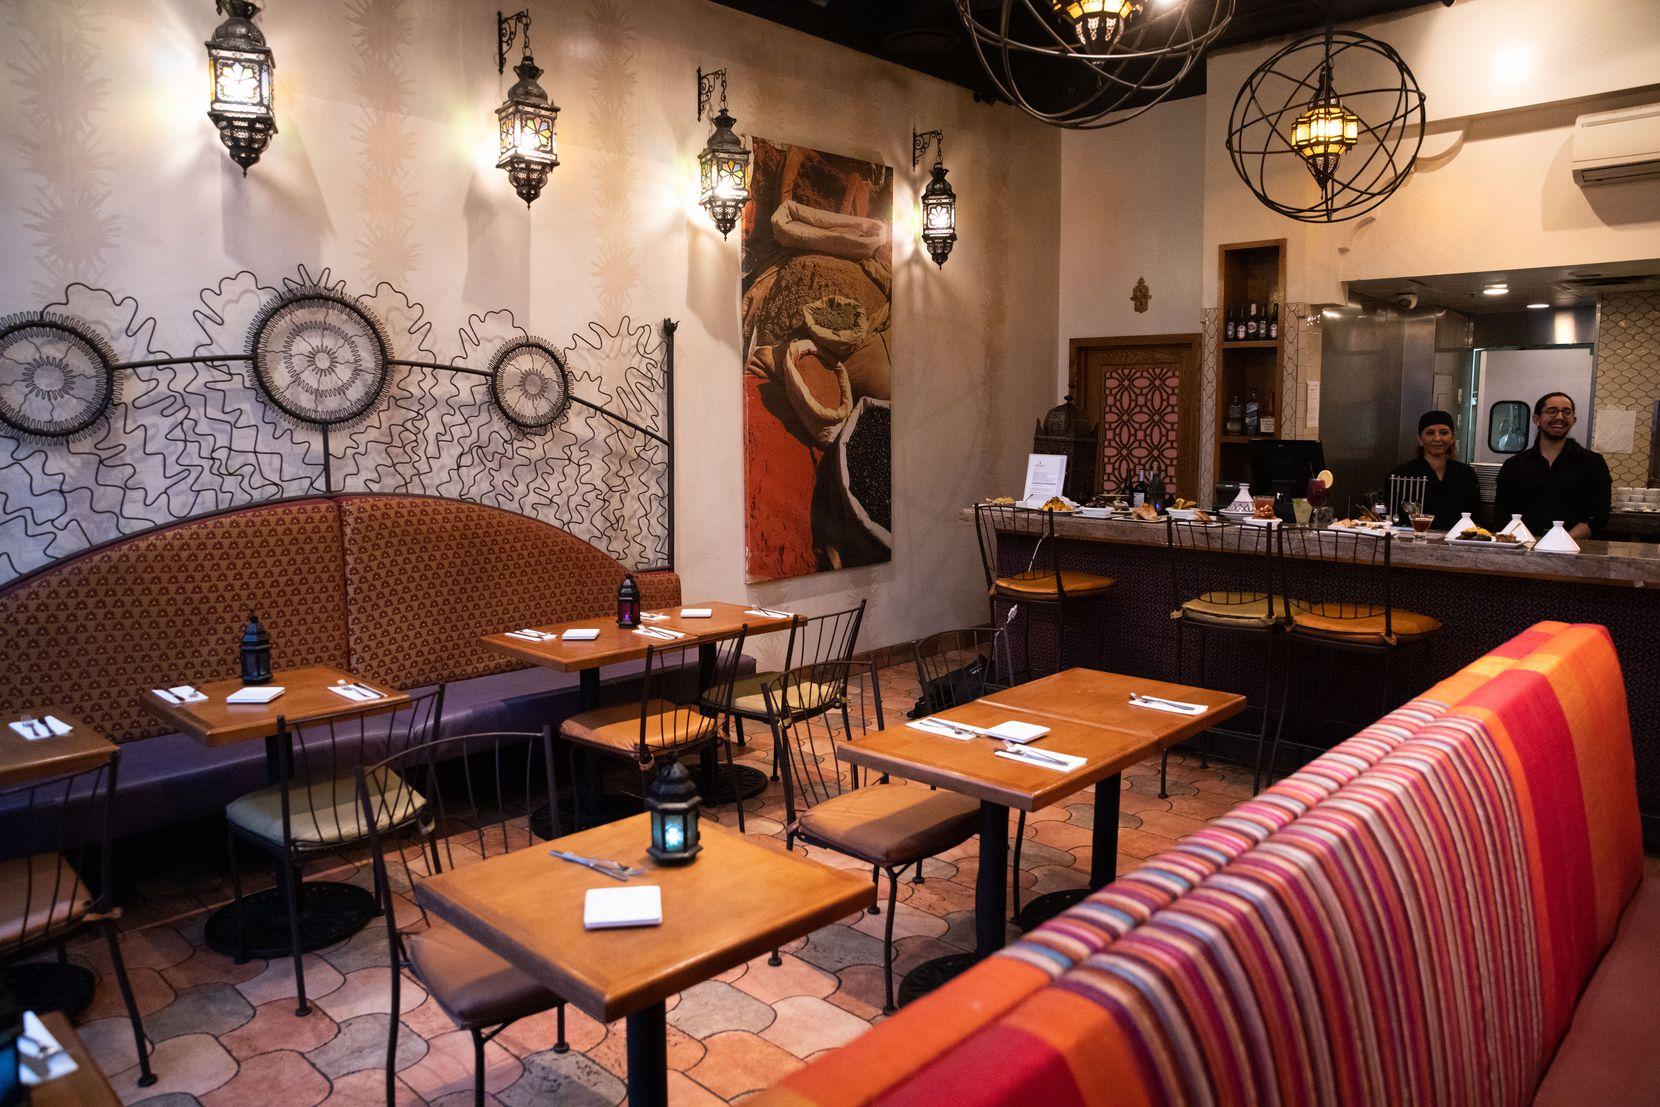 Medina Oven & Bar, a Moroccan-Mediterranean cuisine restaurant located in Victory Park in Dallas